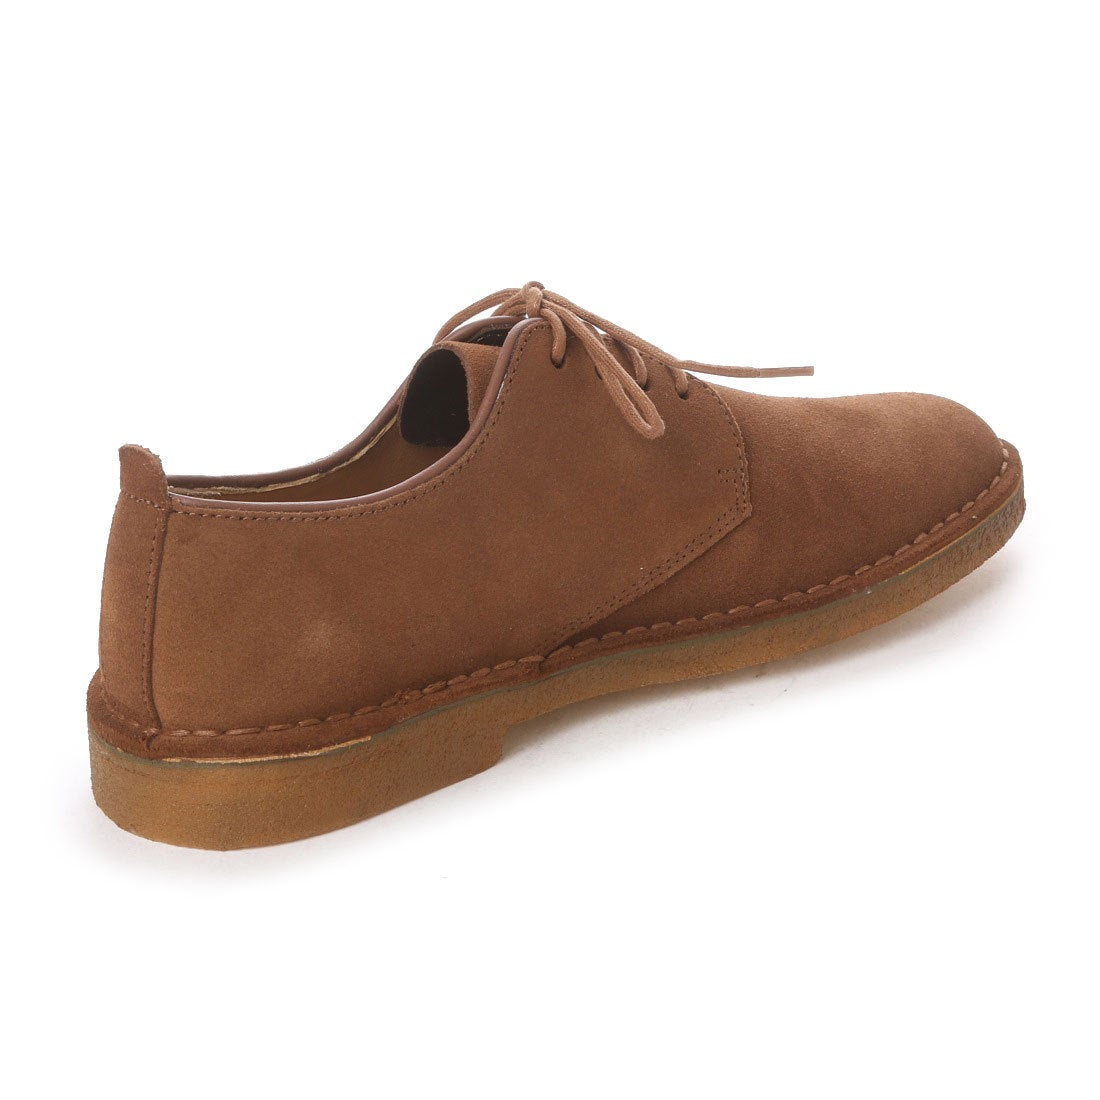 Clarks Original Desert London Cola Mens Shoes